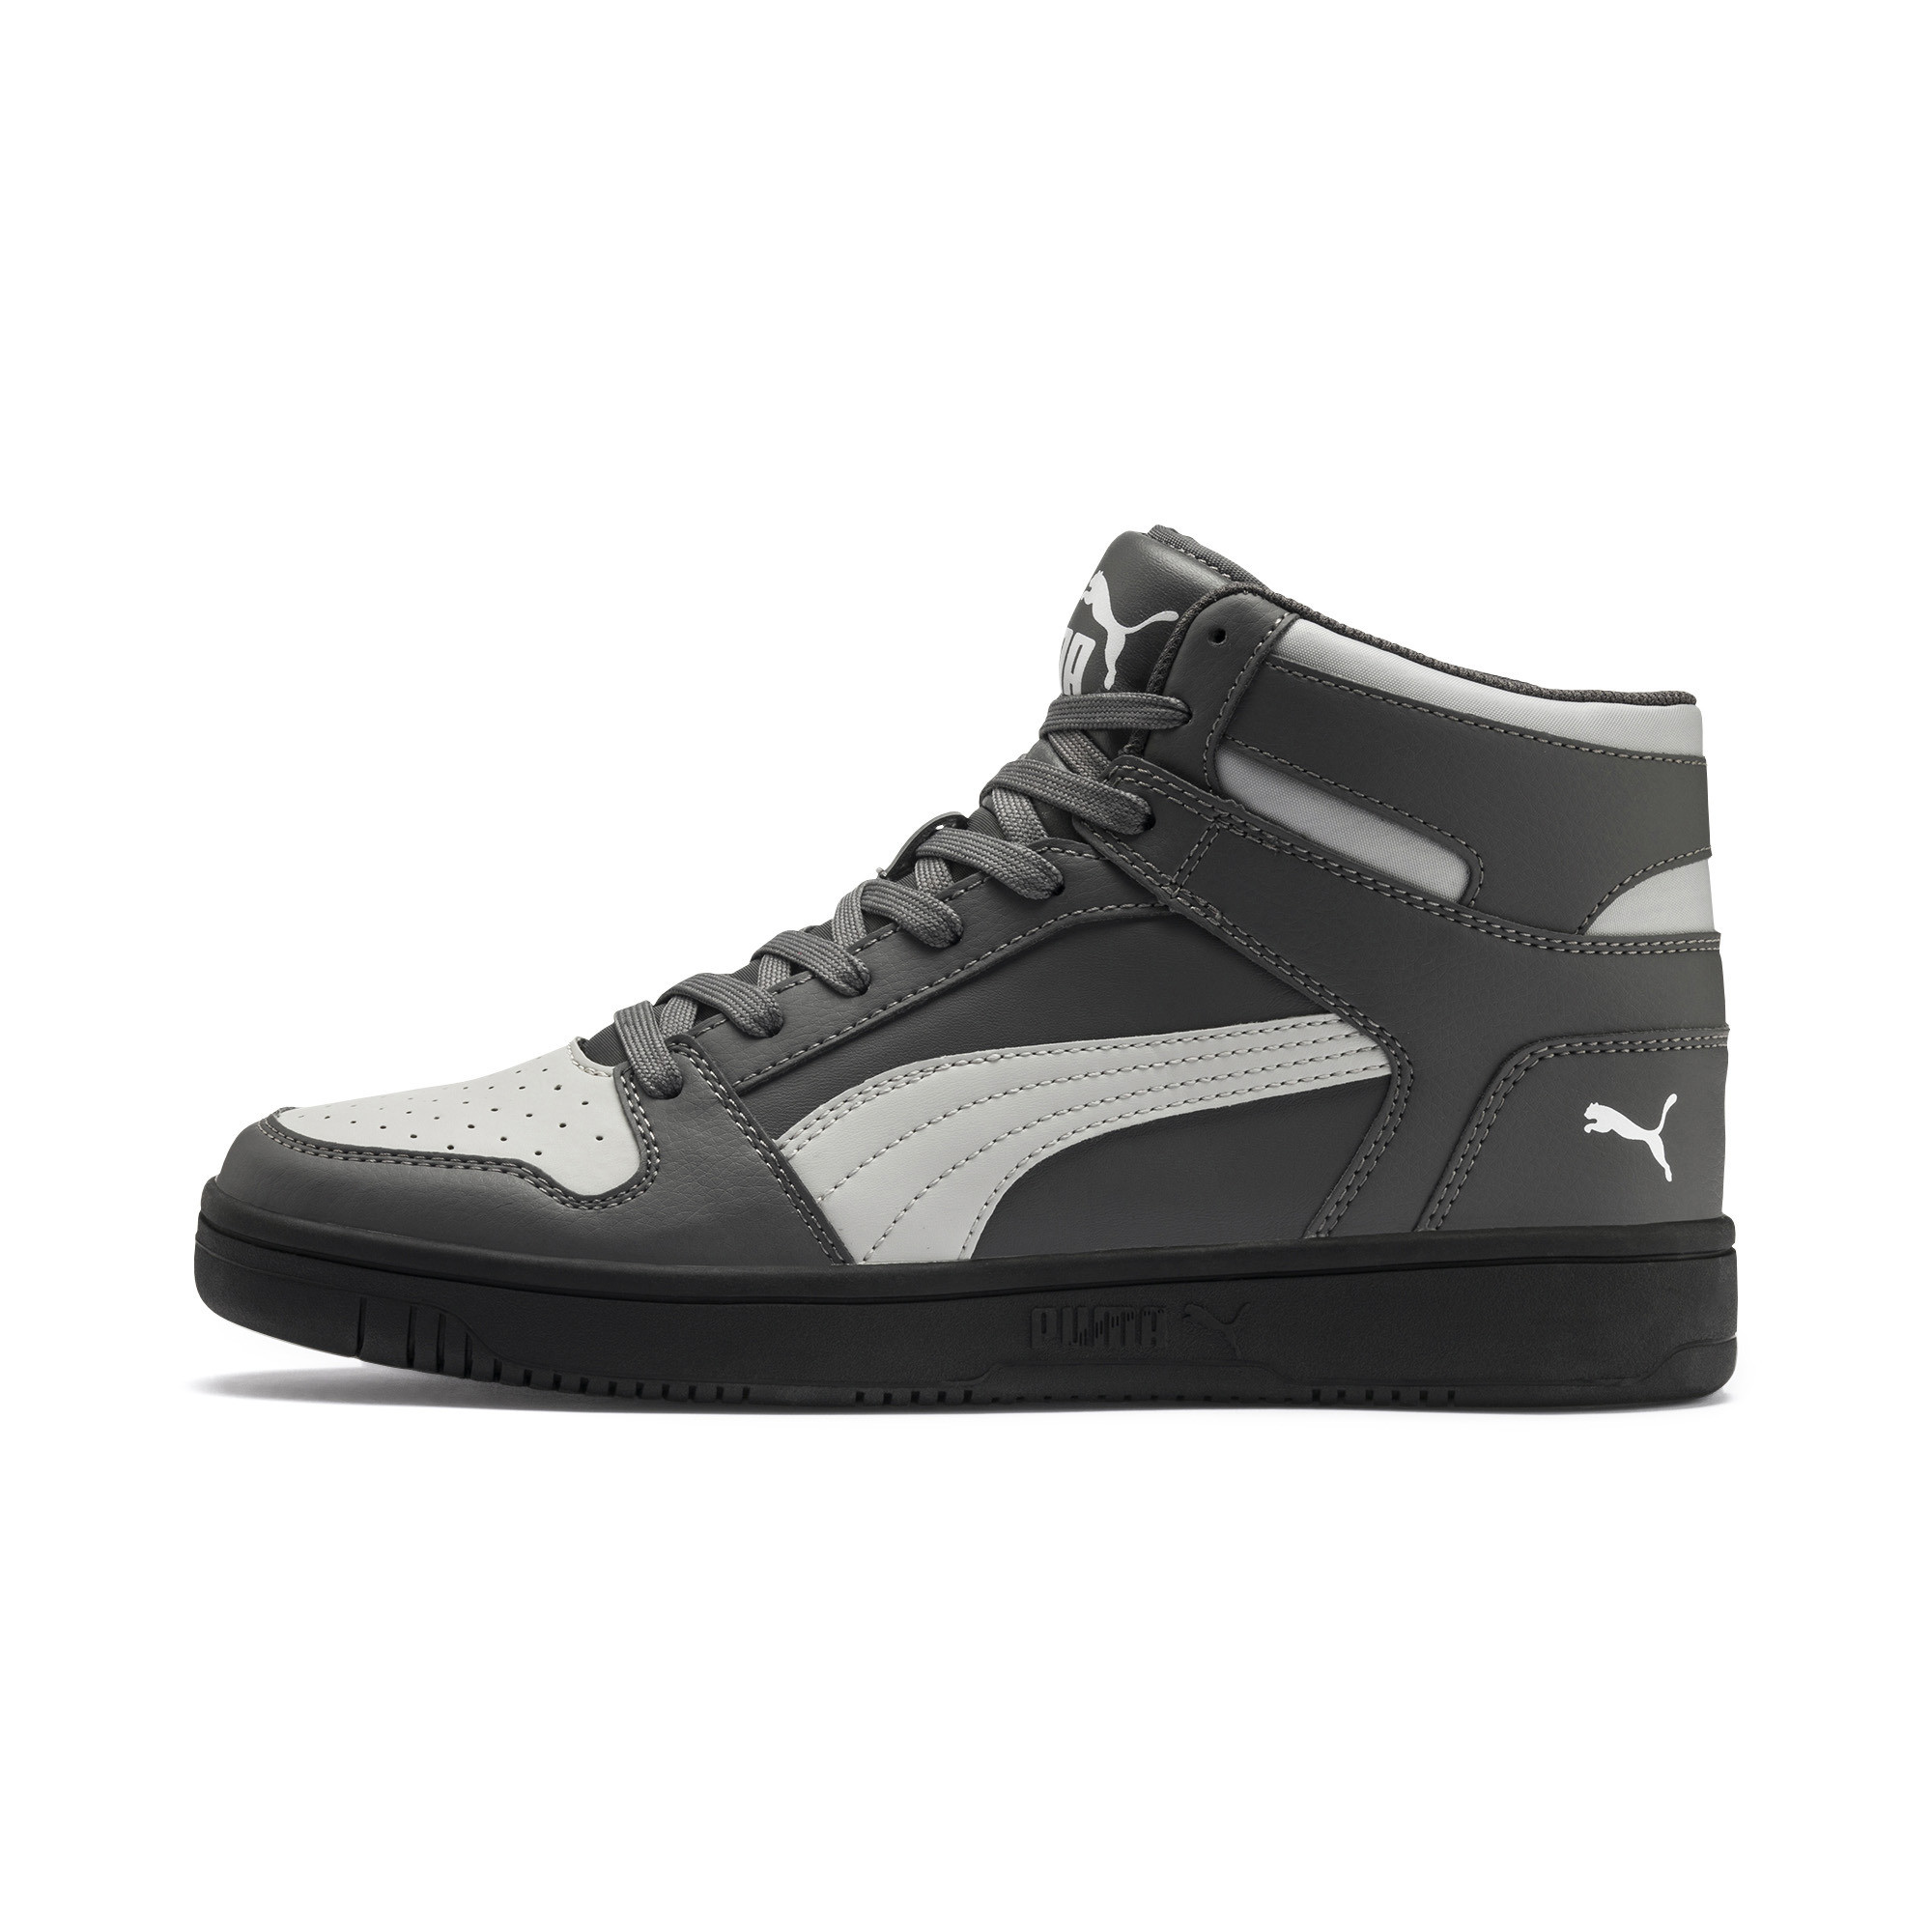 PUMA-PUMA-Rebound-LayUp-Men-039-s-Sneakers-Men-Mid-Boot-Basics thumbnail 10